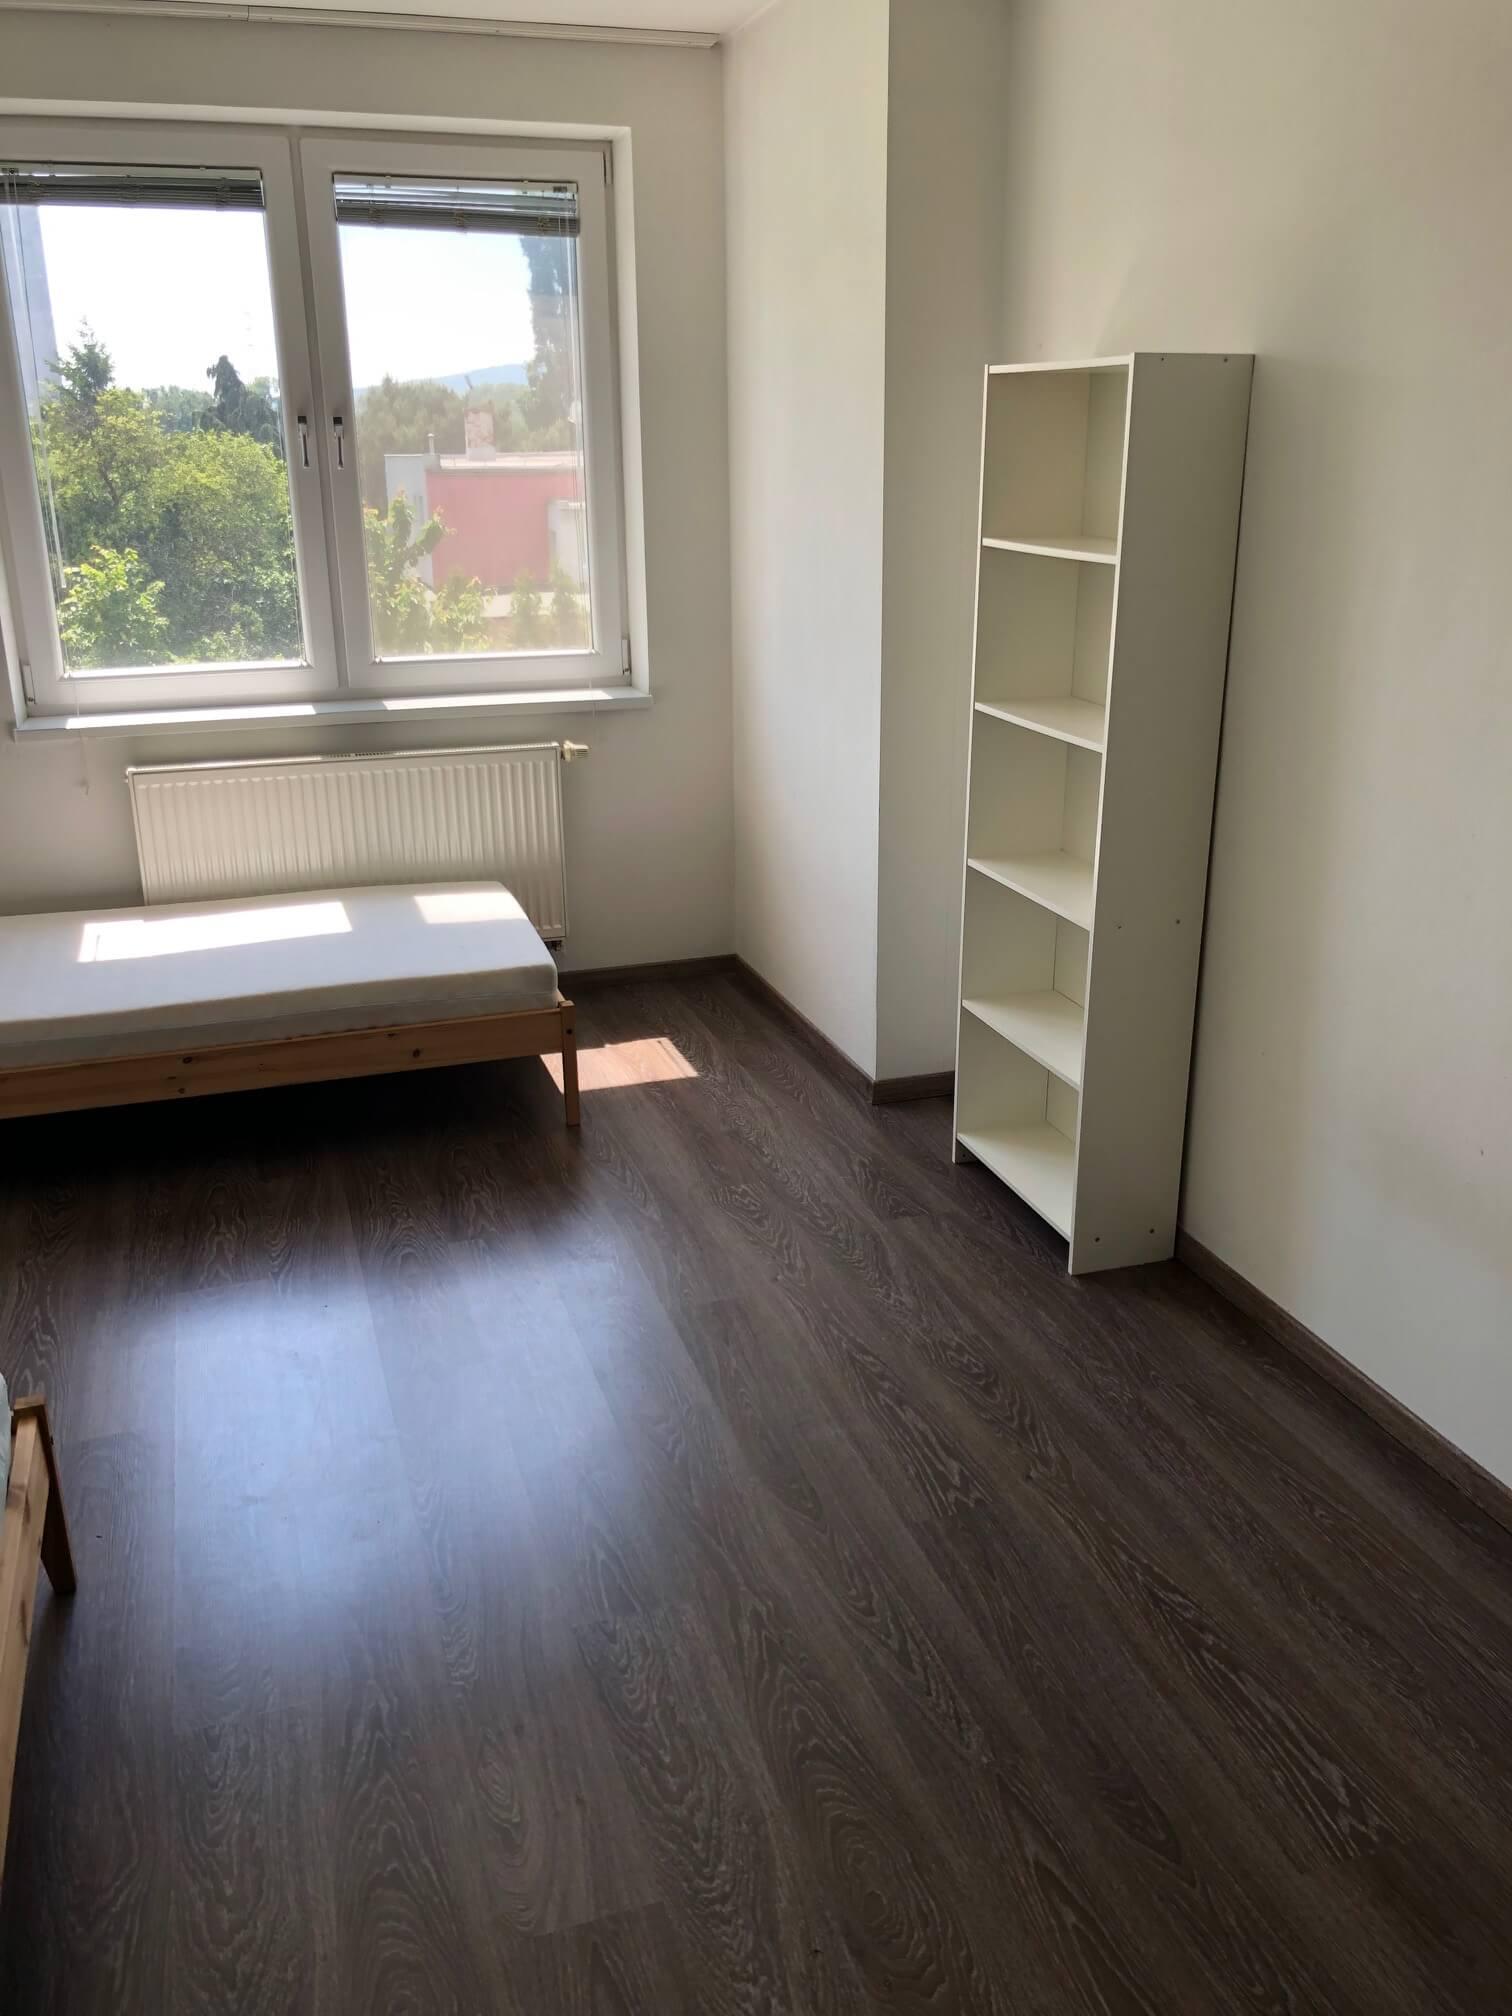 Rezervované: 3 izbový byt, novostavba, 72,25m2, loggia 4,82m2, Staré Grunty, Karlovka, garážové státie-26